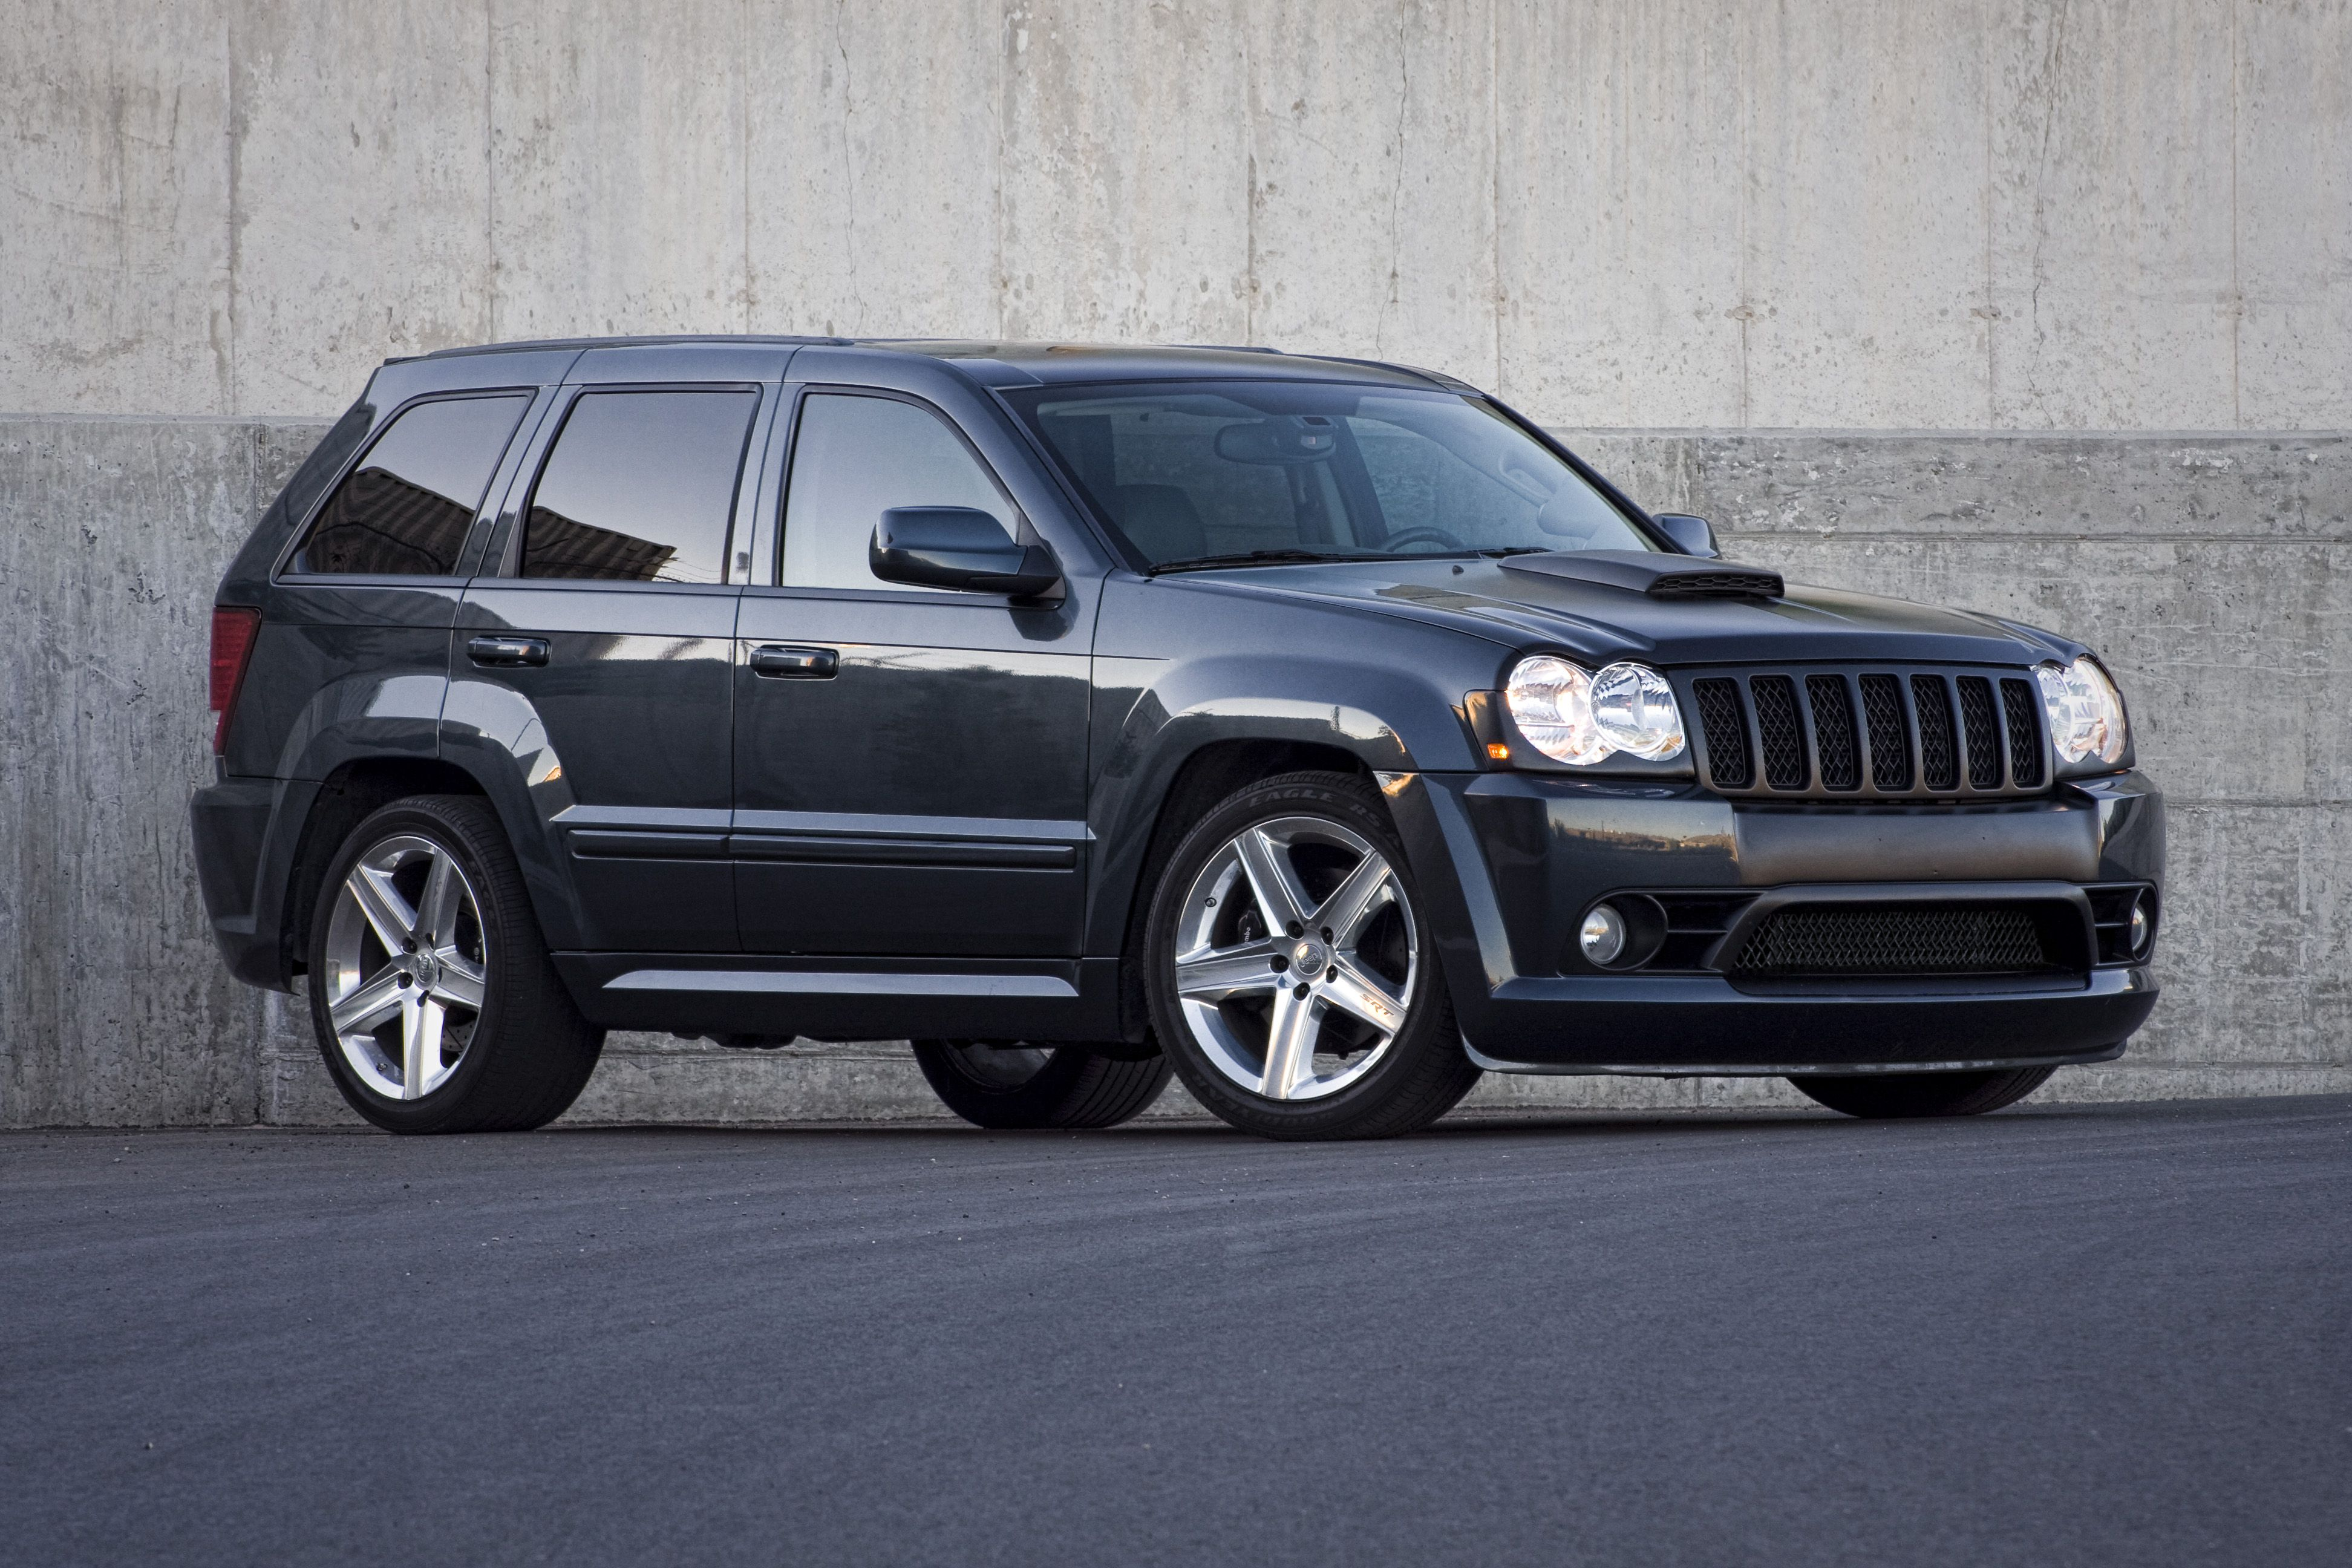 2014 jeep grand cherokee srt8 sexy grand cherokee pinterest grand cherokee srt8 cherokee srt8 and 2014 jeep grand cherokee